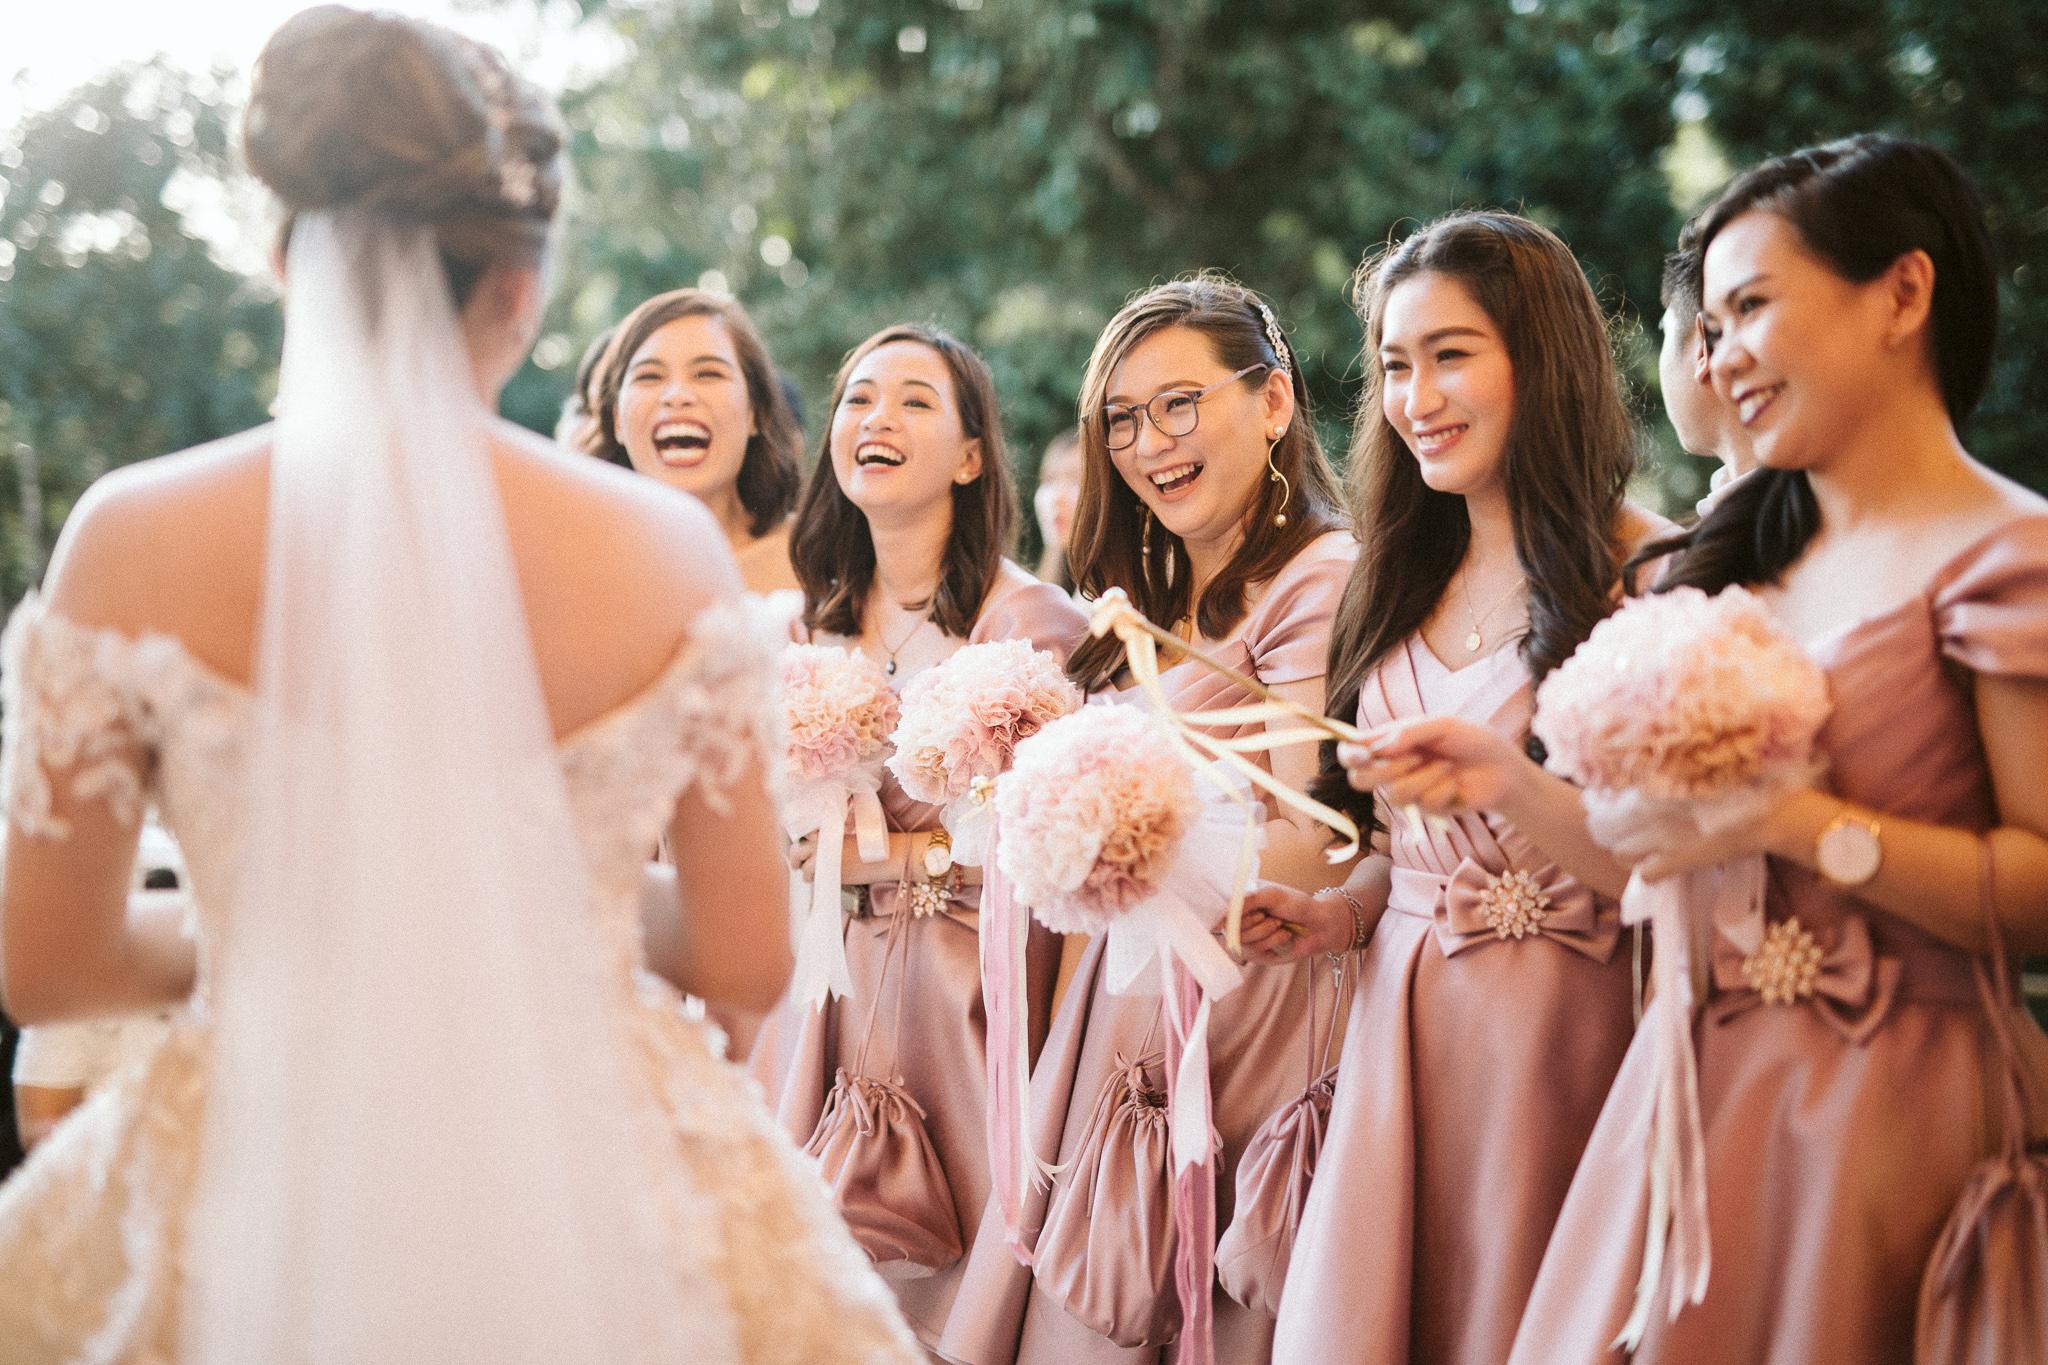 Bea's Bridesmaids